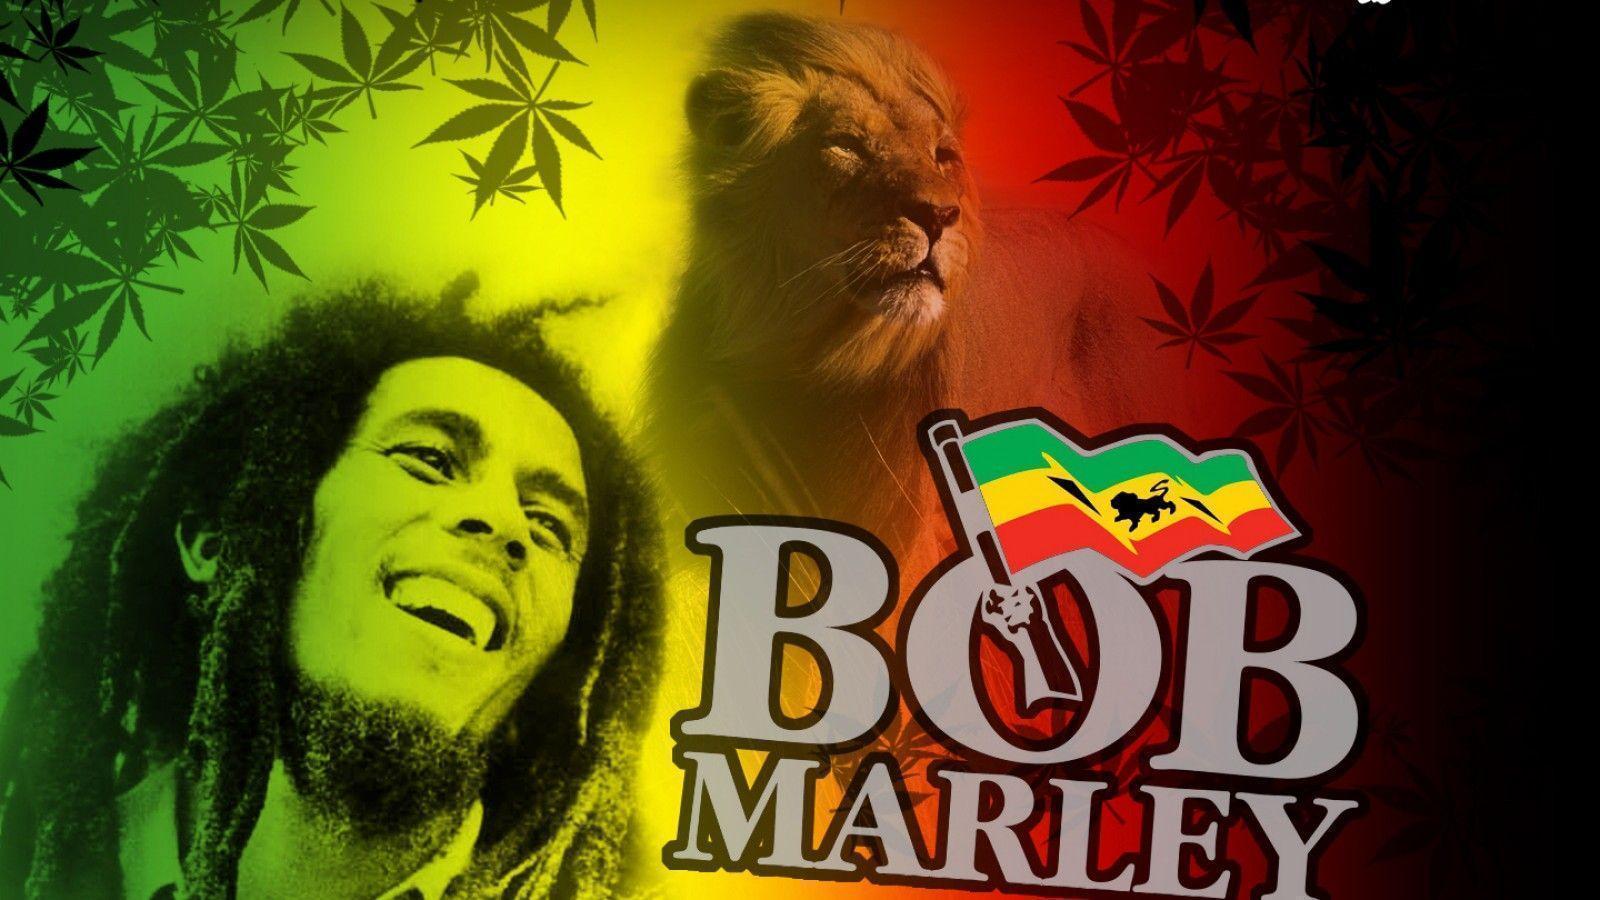 Wallpaper Of Bob Marley